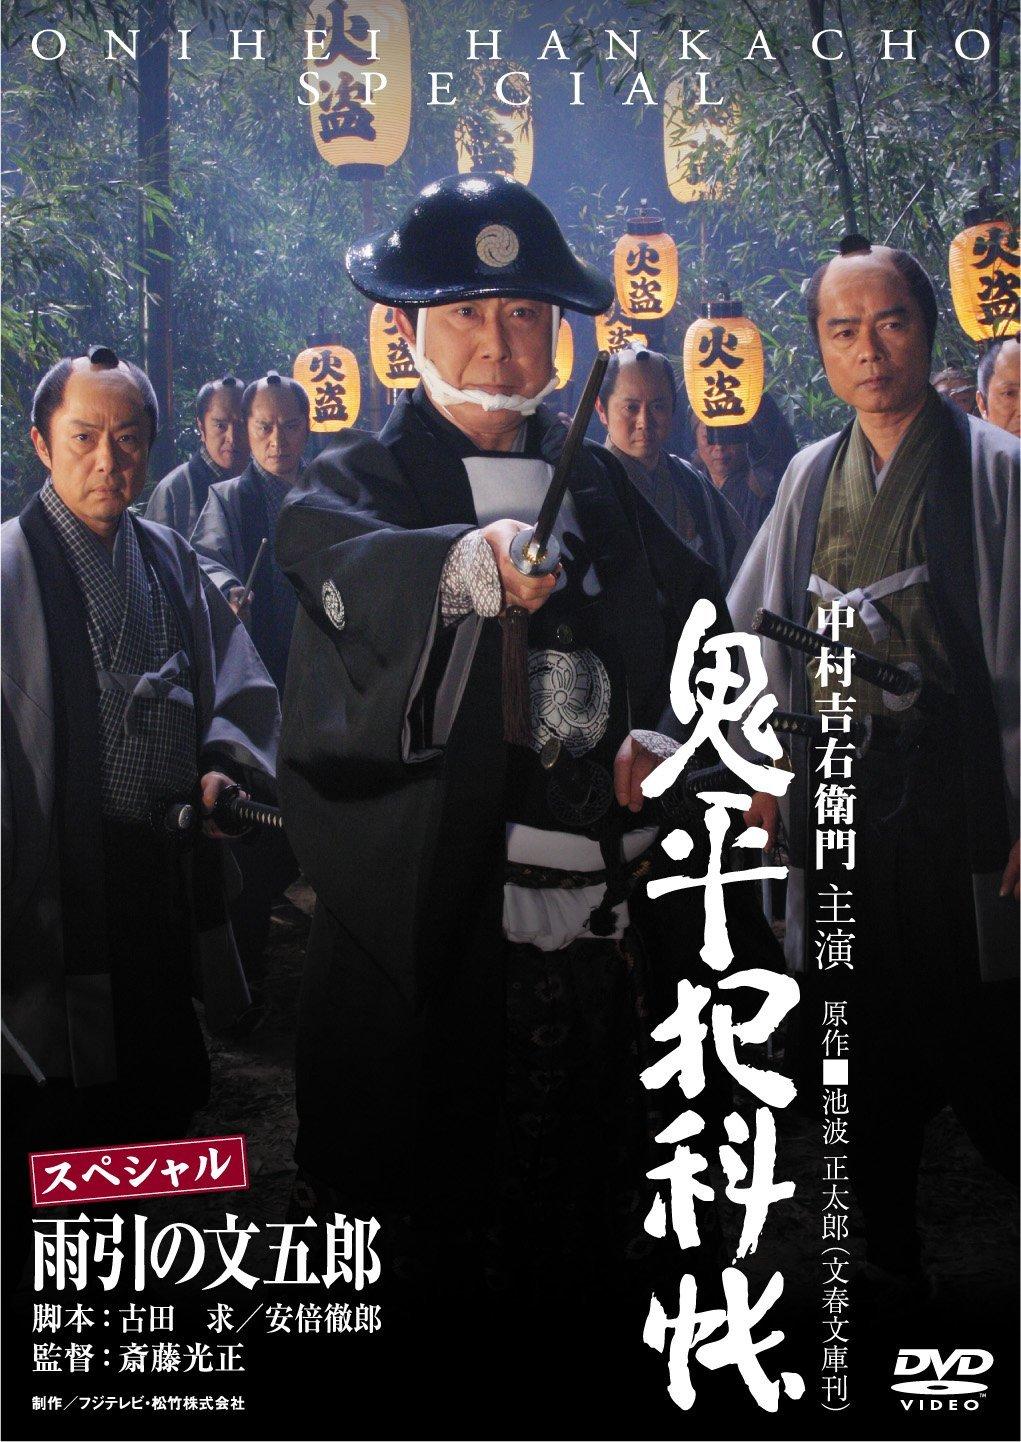 [MOVIES] 鬼平犯科帳スペシャル ~雨引の文五郎~ (2009)